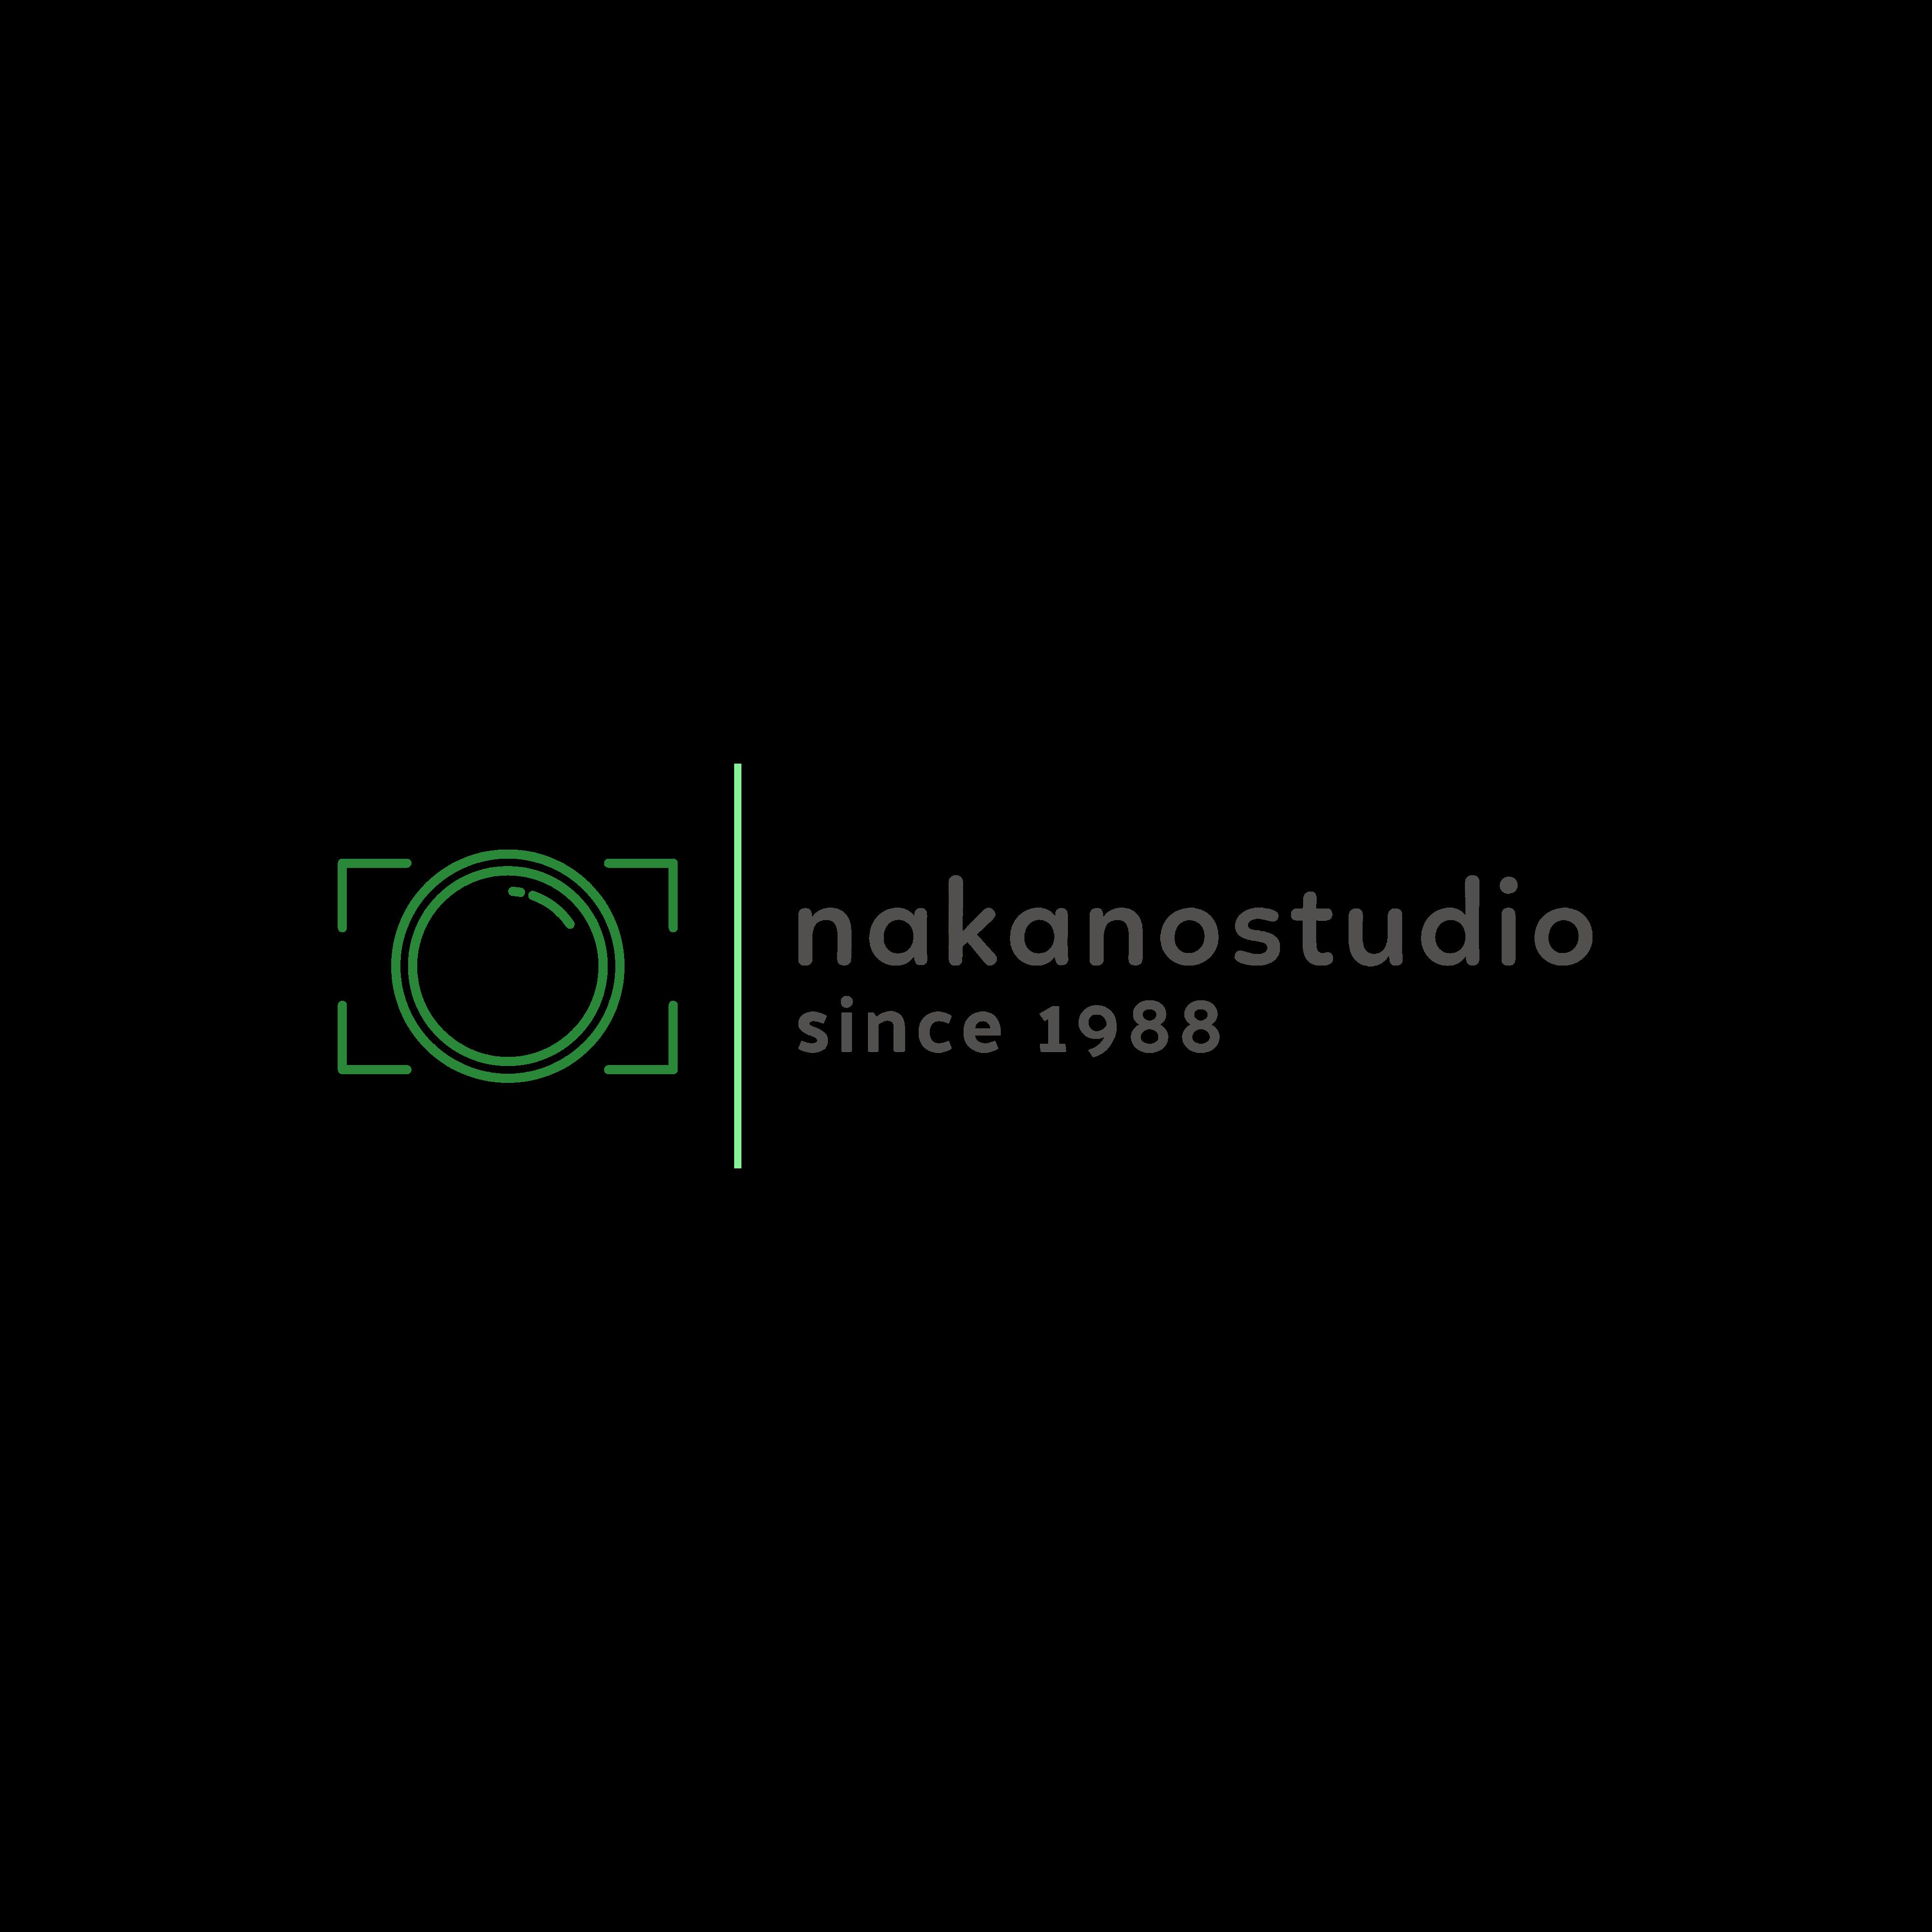 online-logo-maker-for-professional-photo